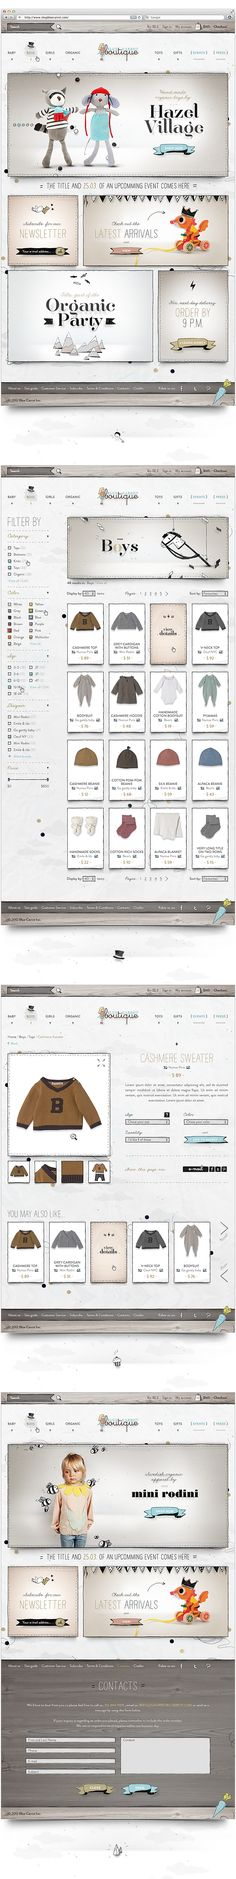 Web design inspiration: texture / paper / whimsical / muted tones   Blue Carrot Boutique   Designer: Stella Petcova